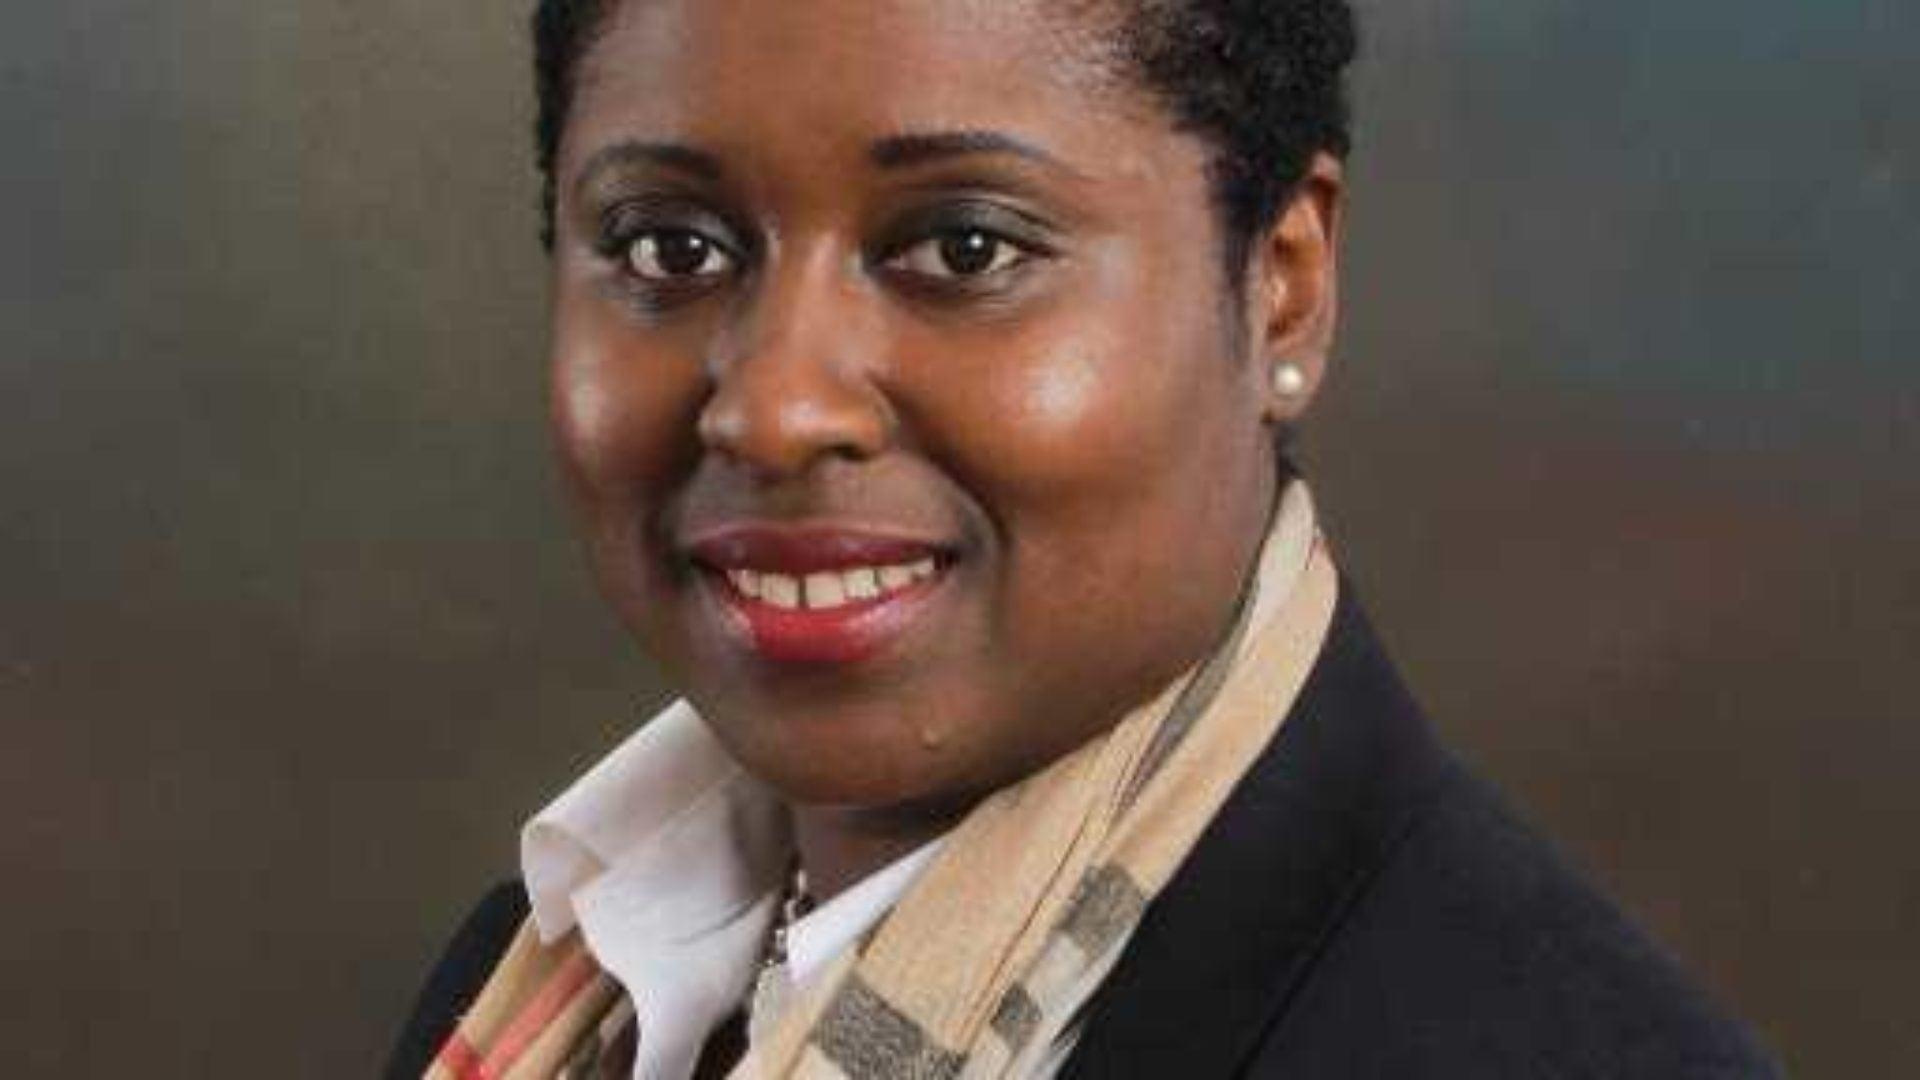 Upper Marlboro, Maryland's First Black Mayor Resigns Amidst Racist Bullying